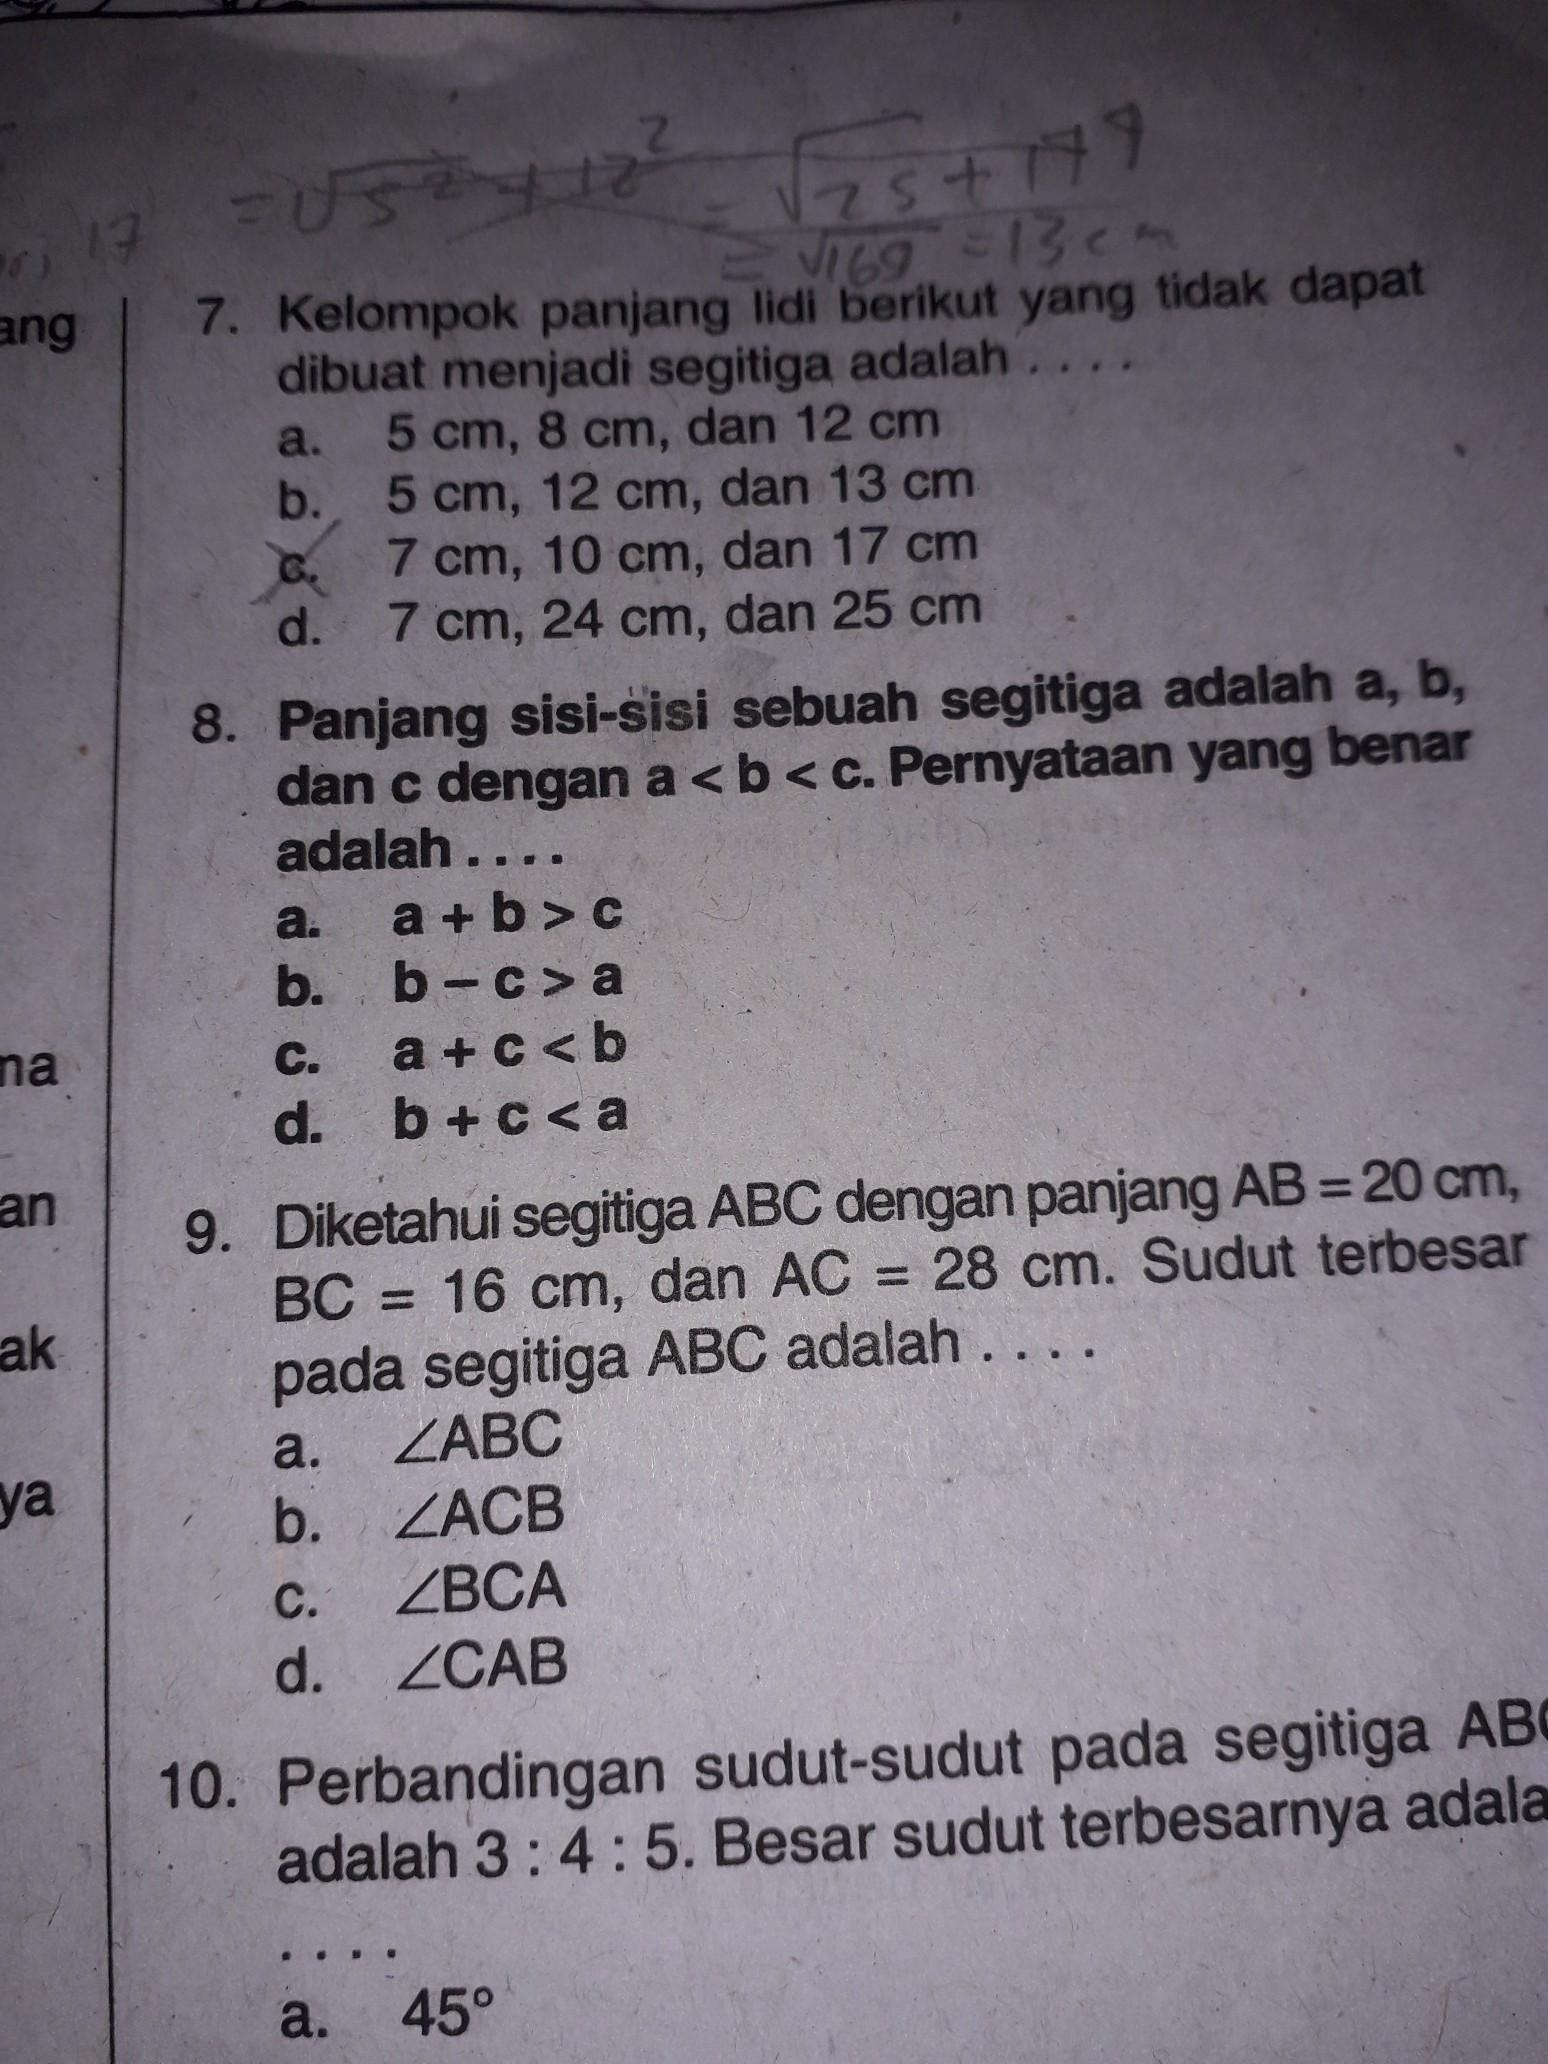 panjang sisi sebuah segitiga adalah a b dan c dengan a